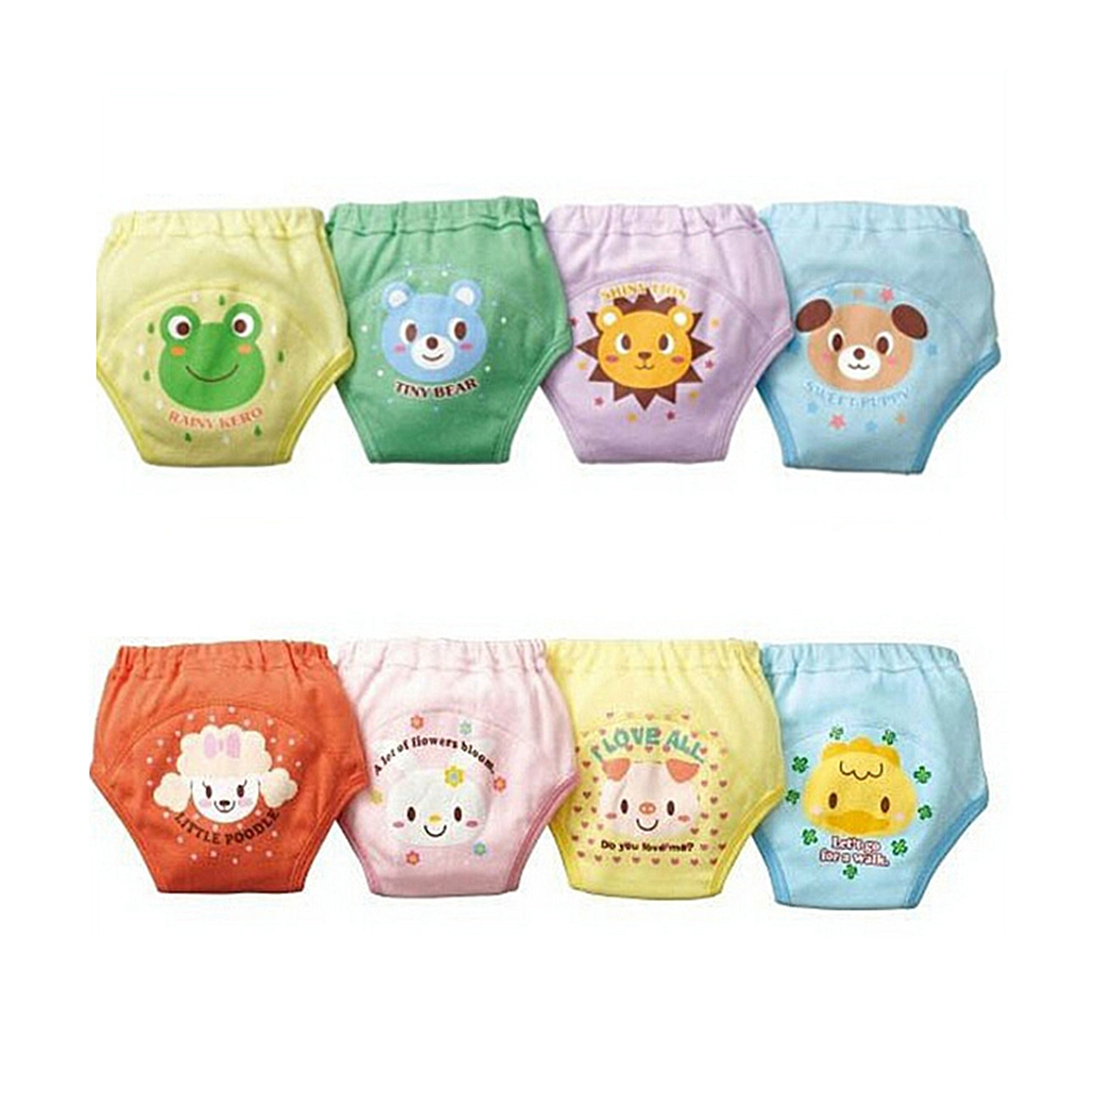 4 X Baby Toddler Girls Boys Cute 4 Layers Waterproof Potty Training Pants reusable 4 Size Random Send